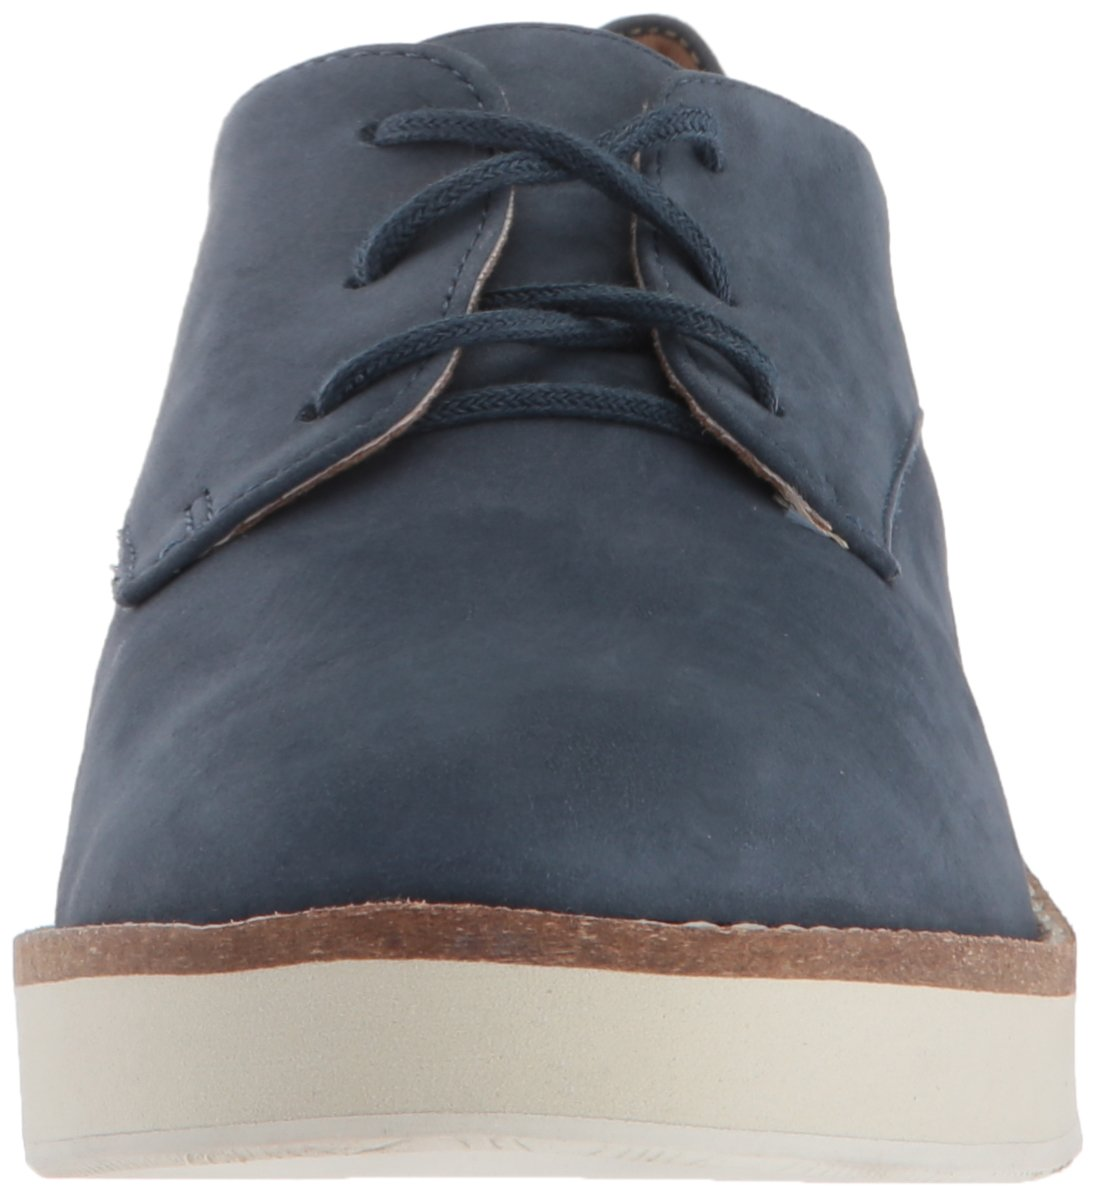 SoftWalk Women's Willis Sneaker B073BW8GTW 12 N US|Denim